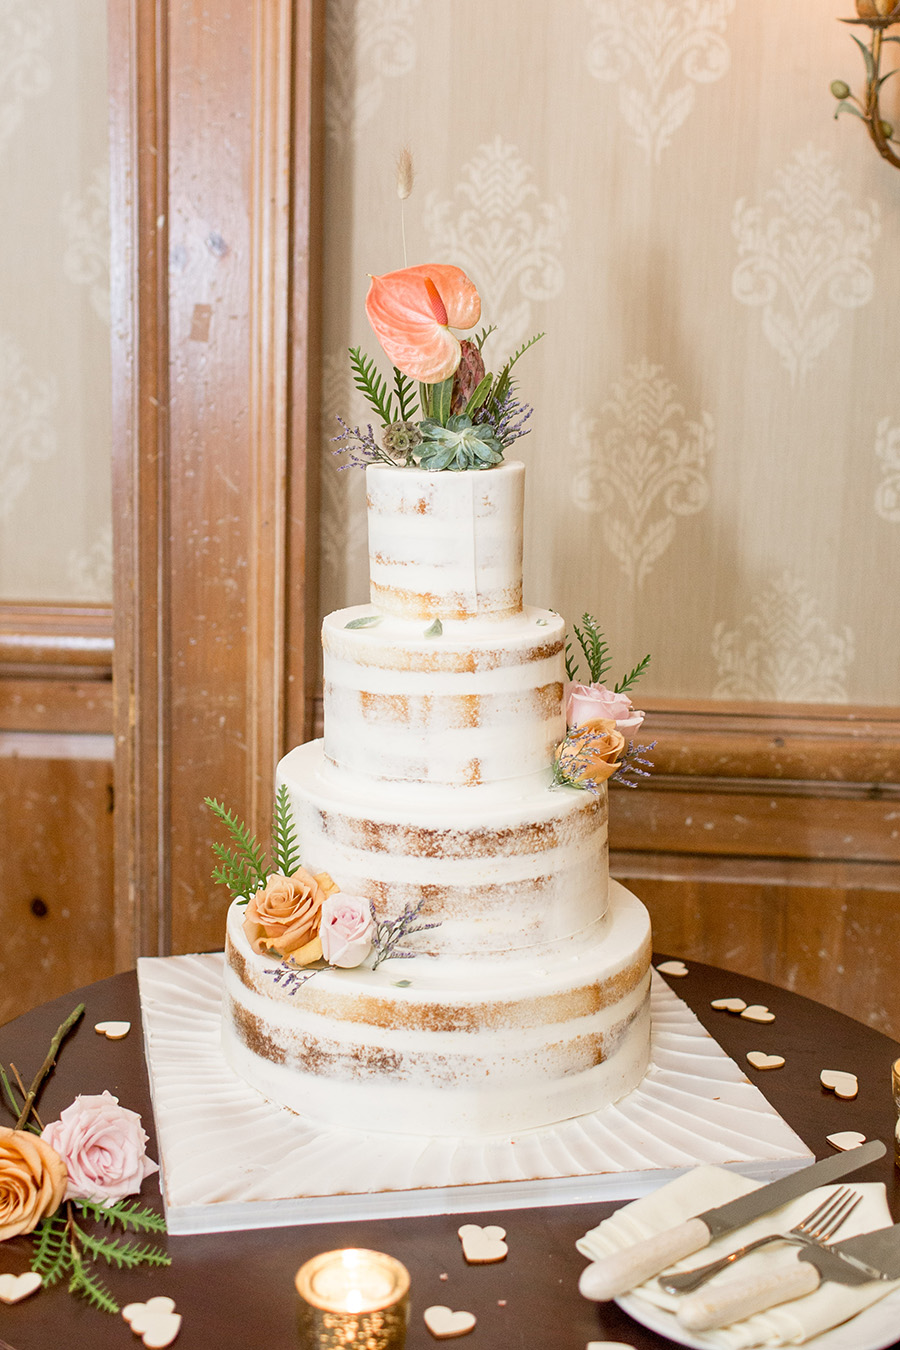 Naked rustic fall wedding cake